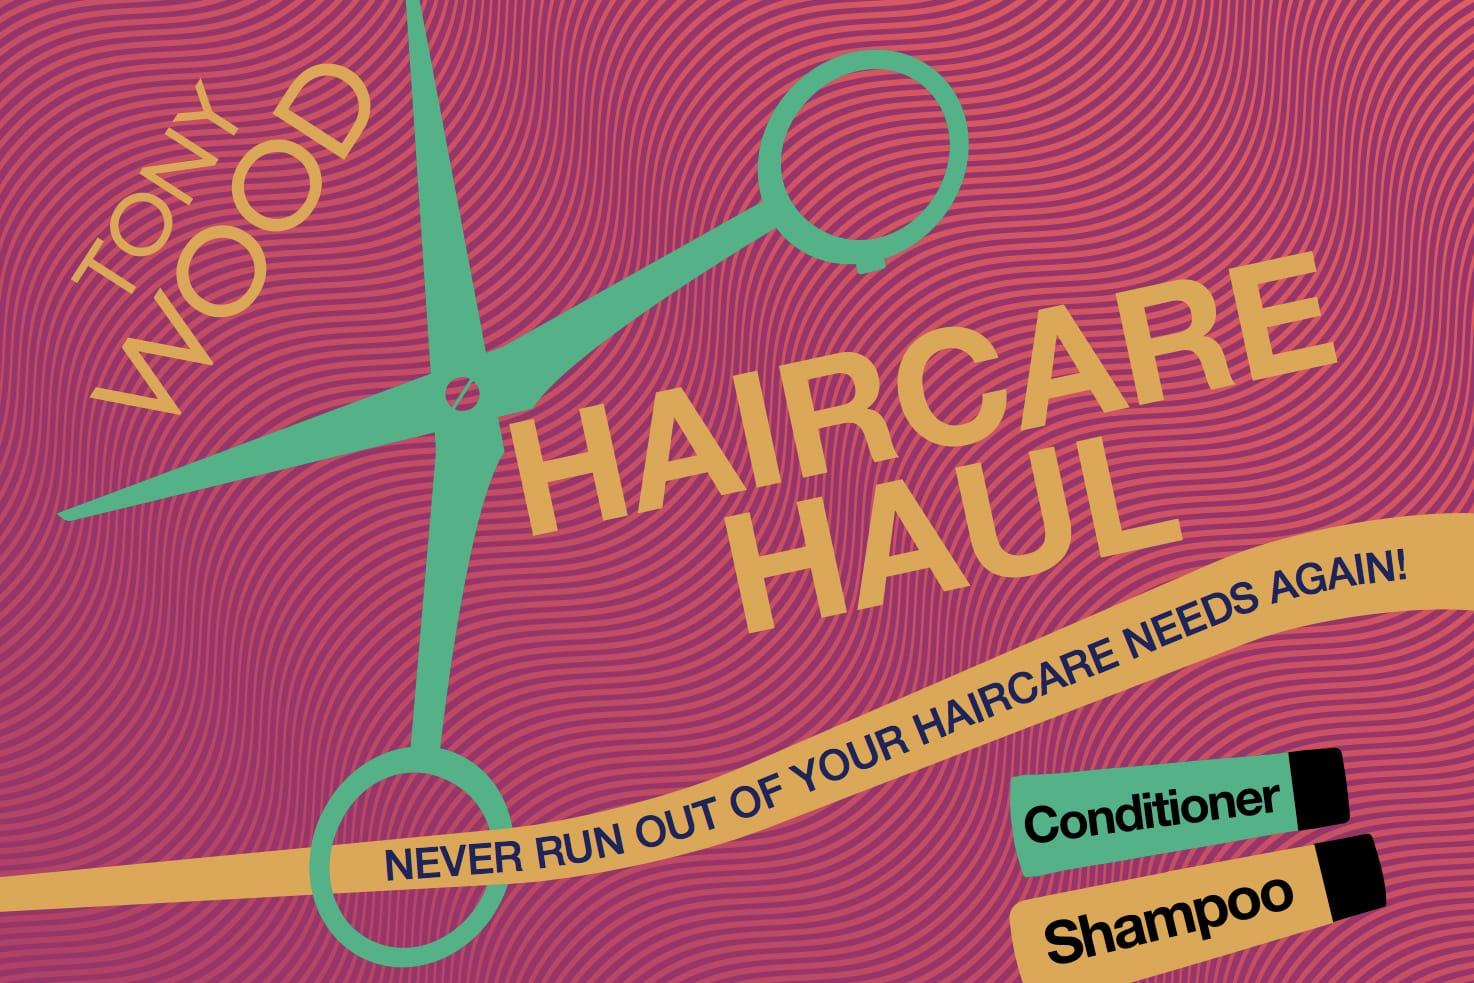 Haircare Haul.jpg